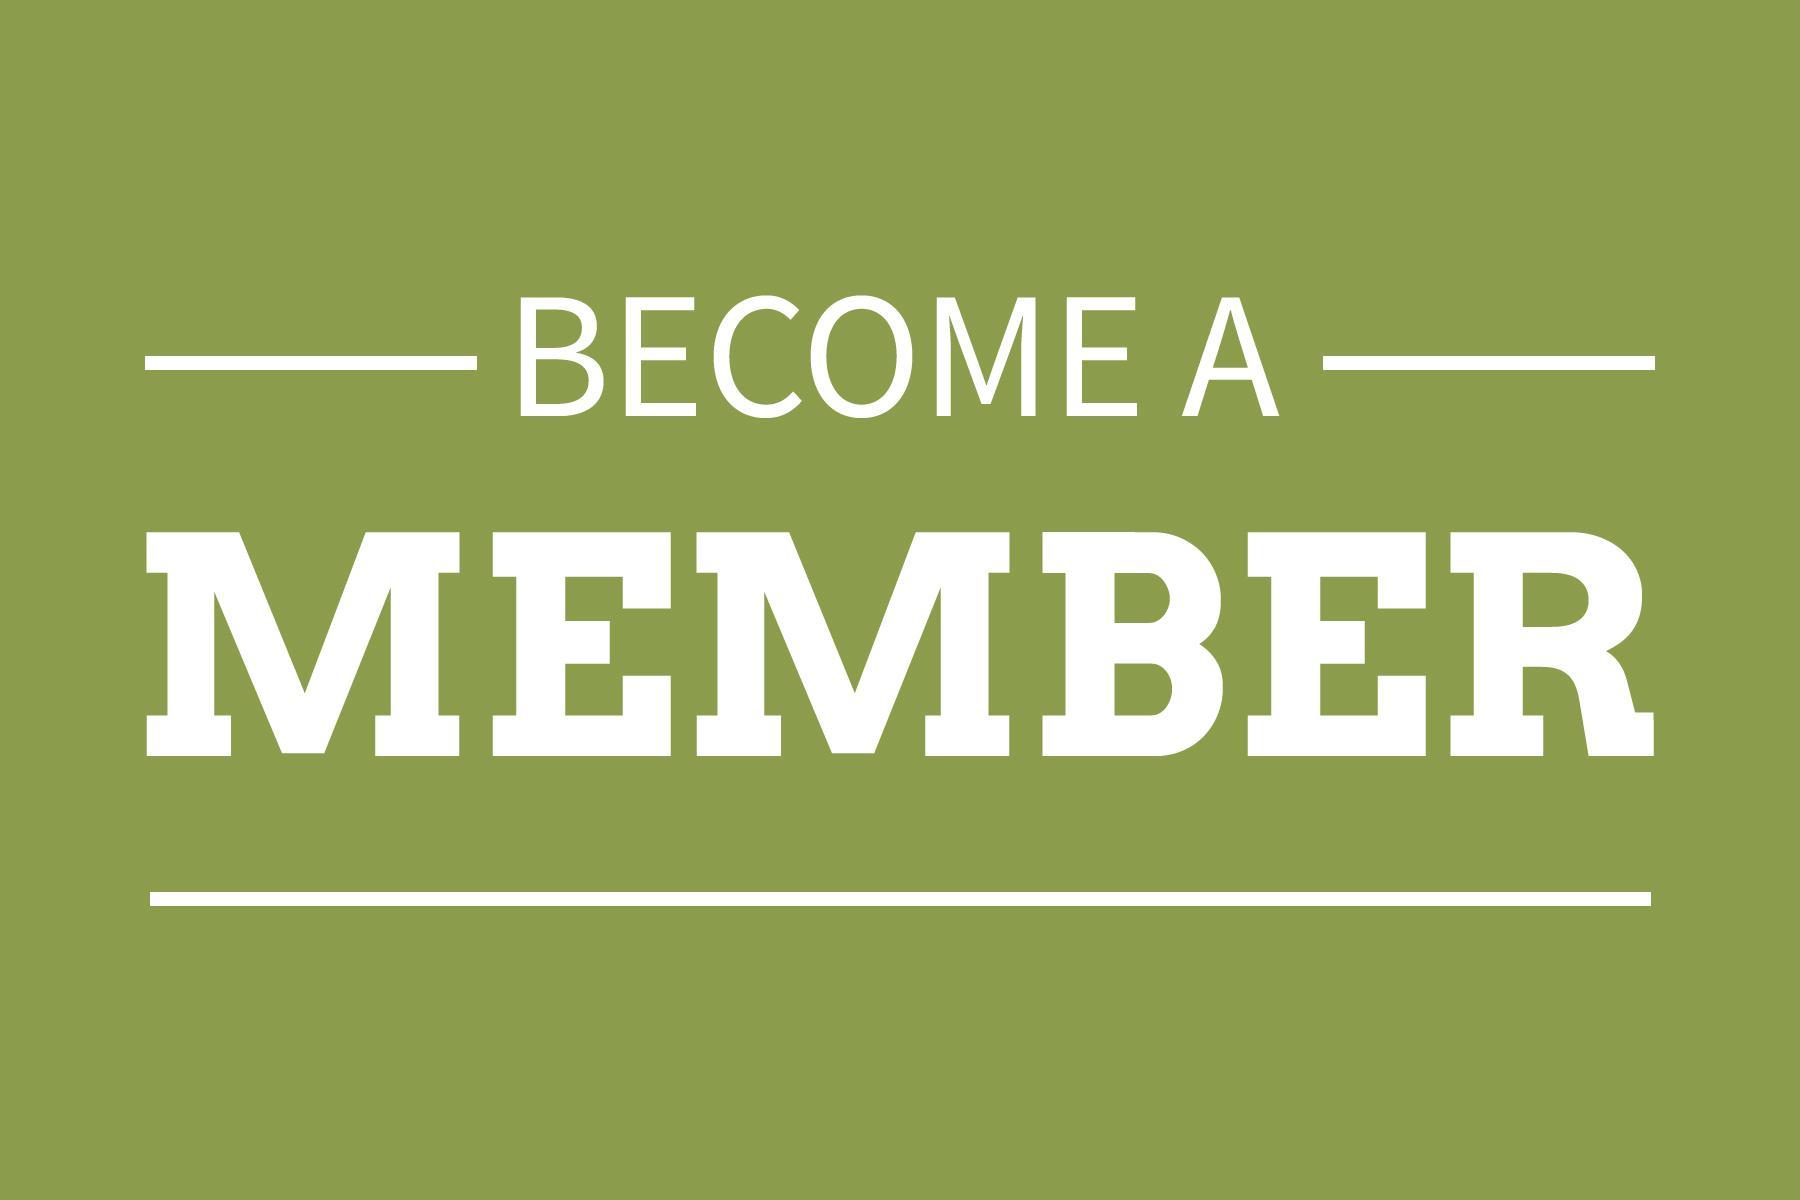 Annual East Fishkill Historical Society Membership Meeting